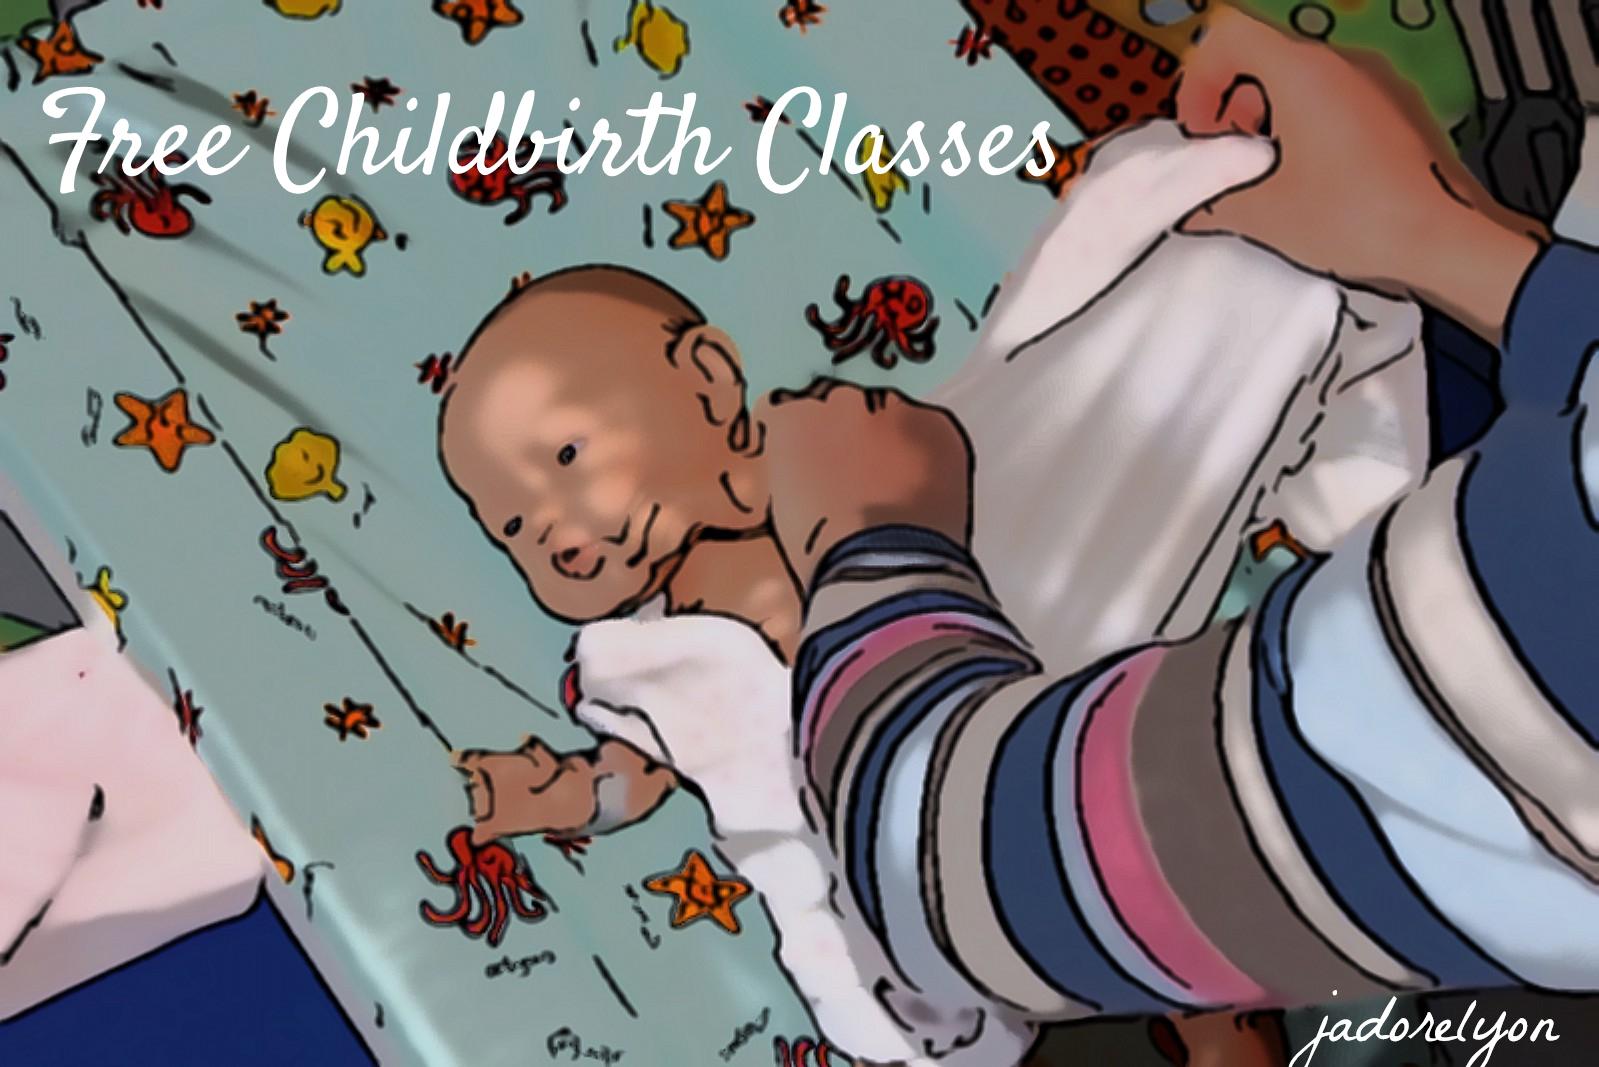 Free childbirth classes